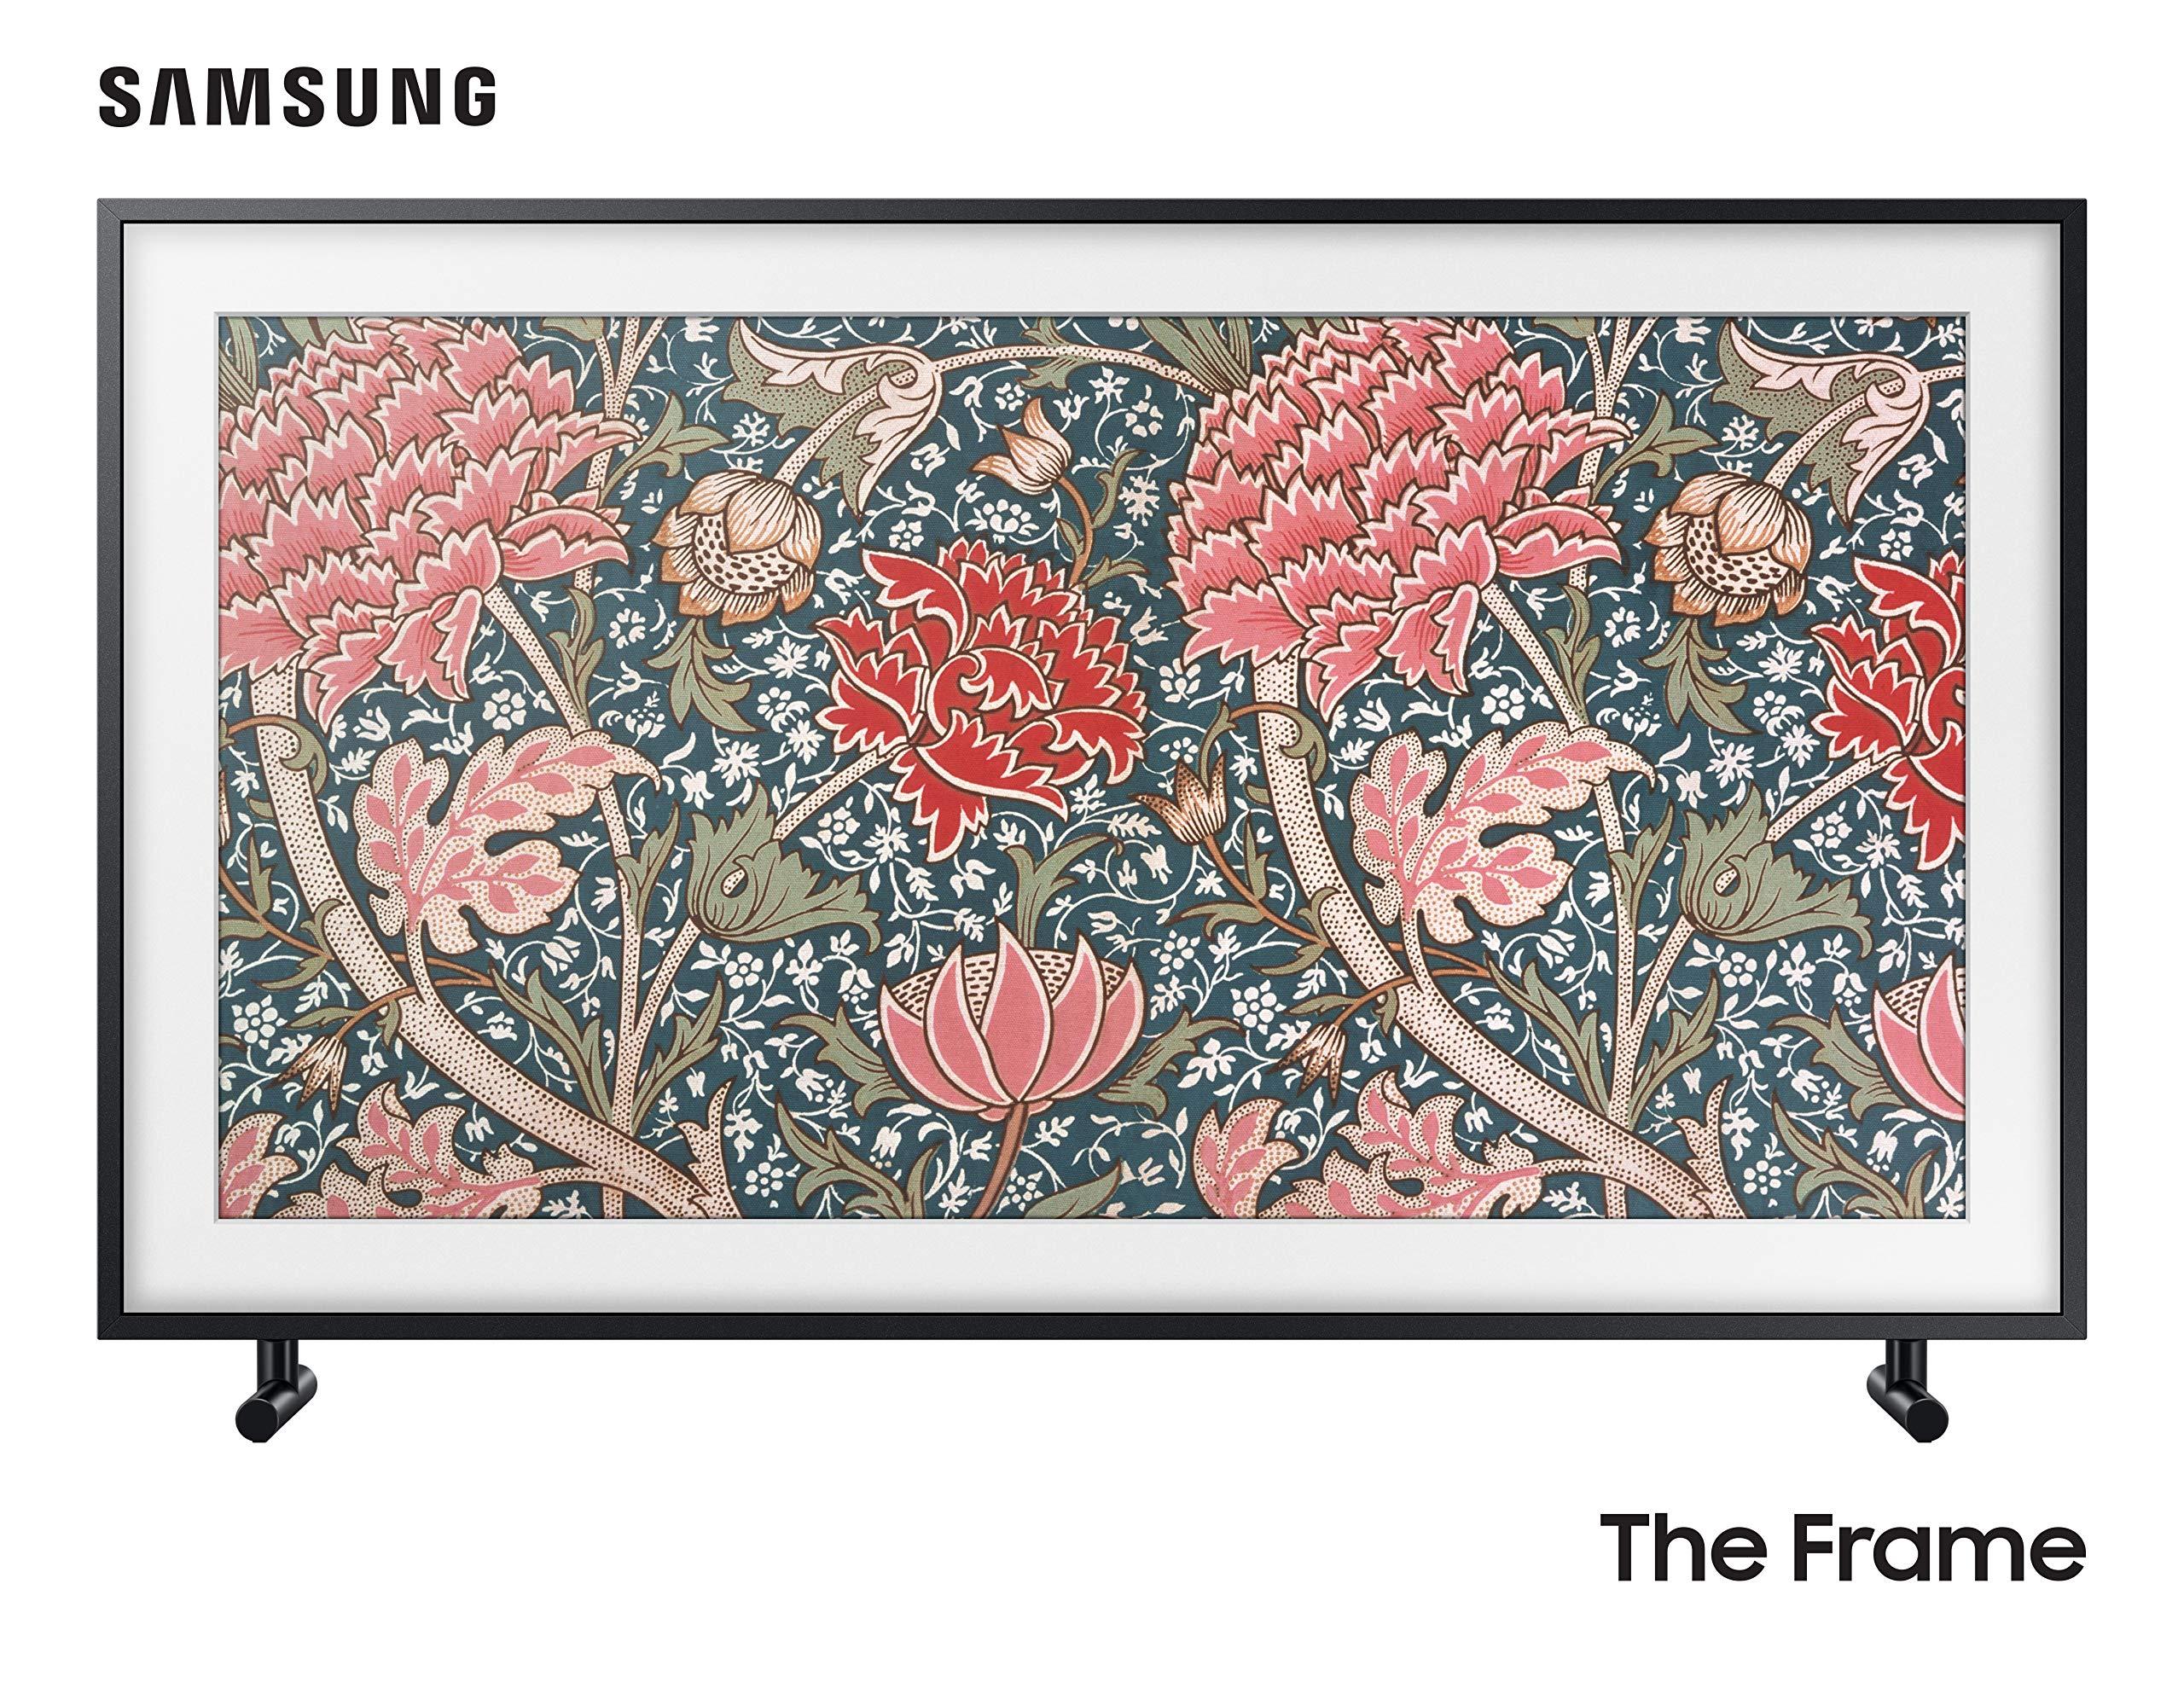 SamsungFrame QLED 4K UHD LS03 Series Smart TV 2019 1